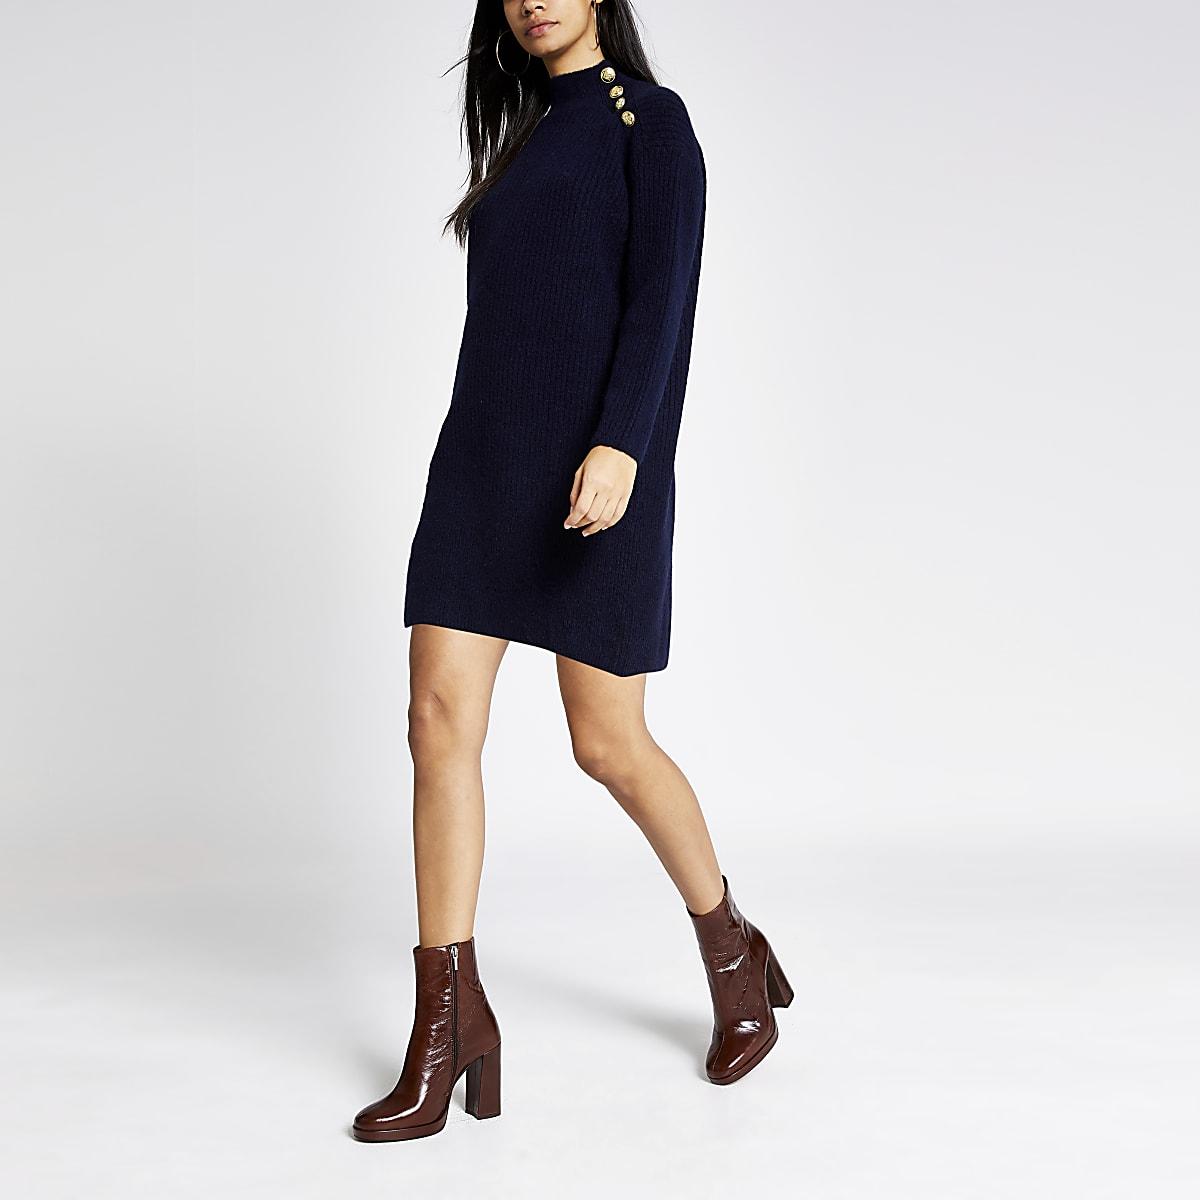 Navy button shoulder knitted jumper dress